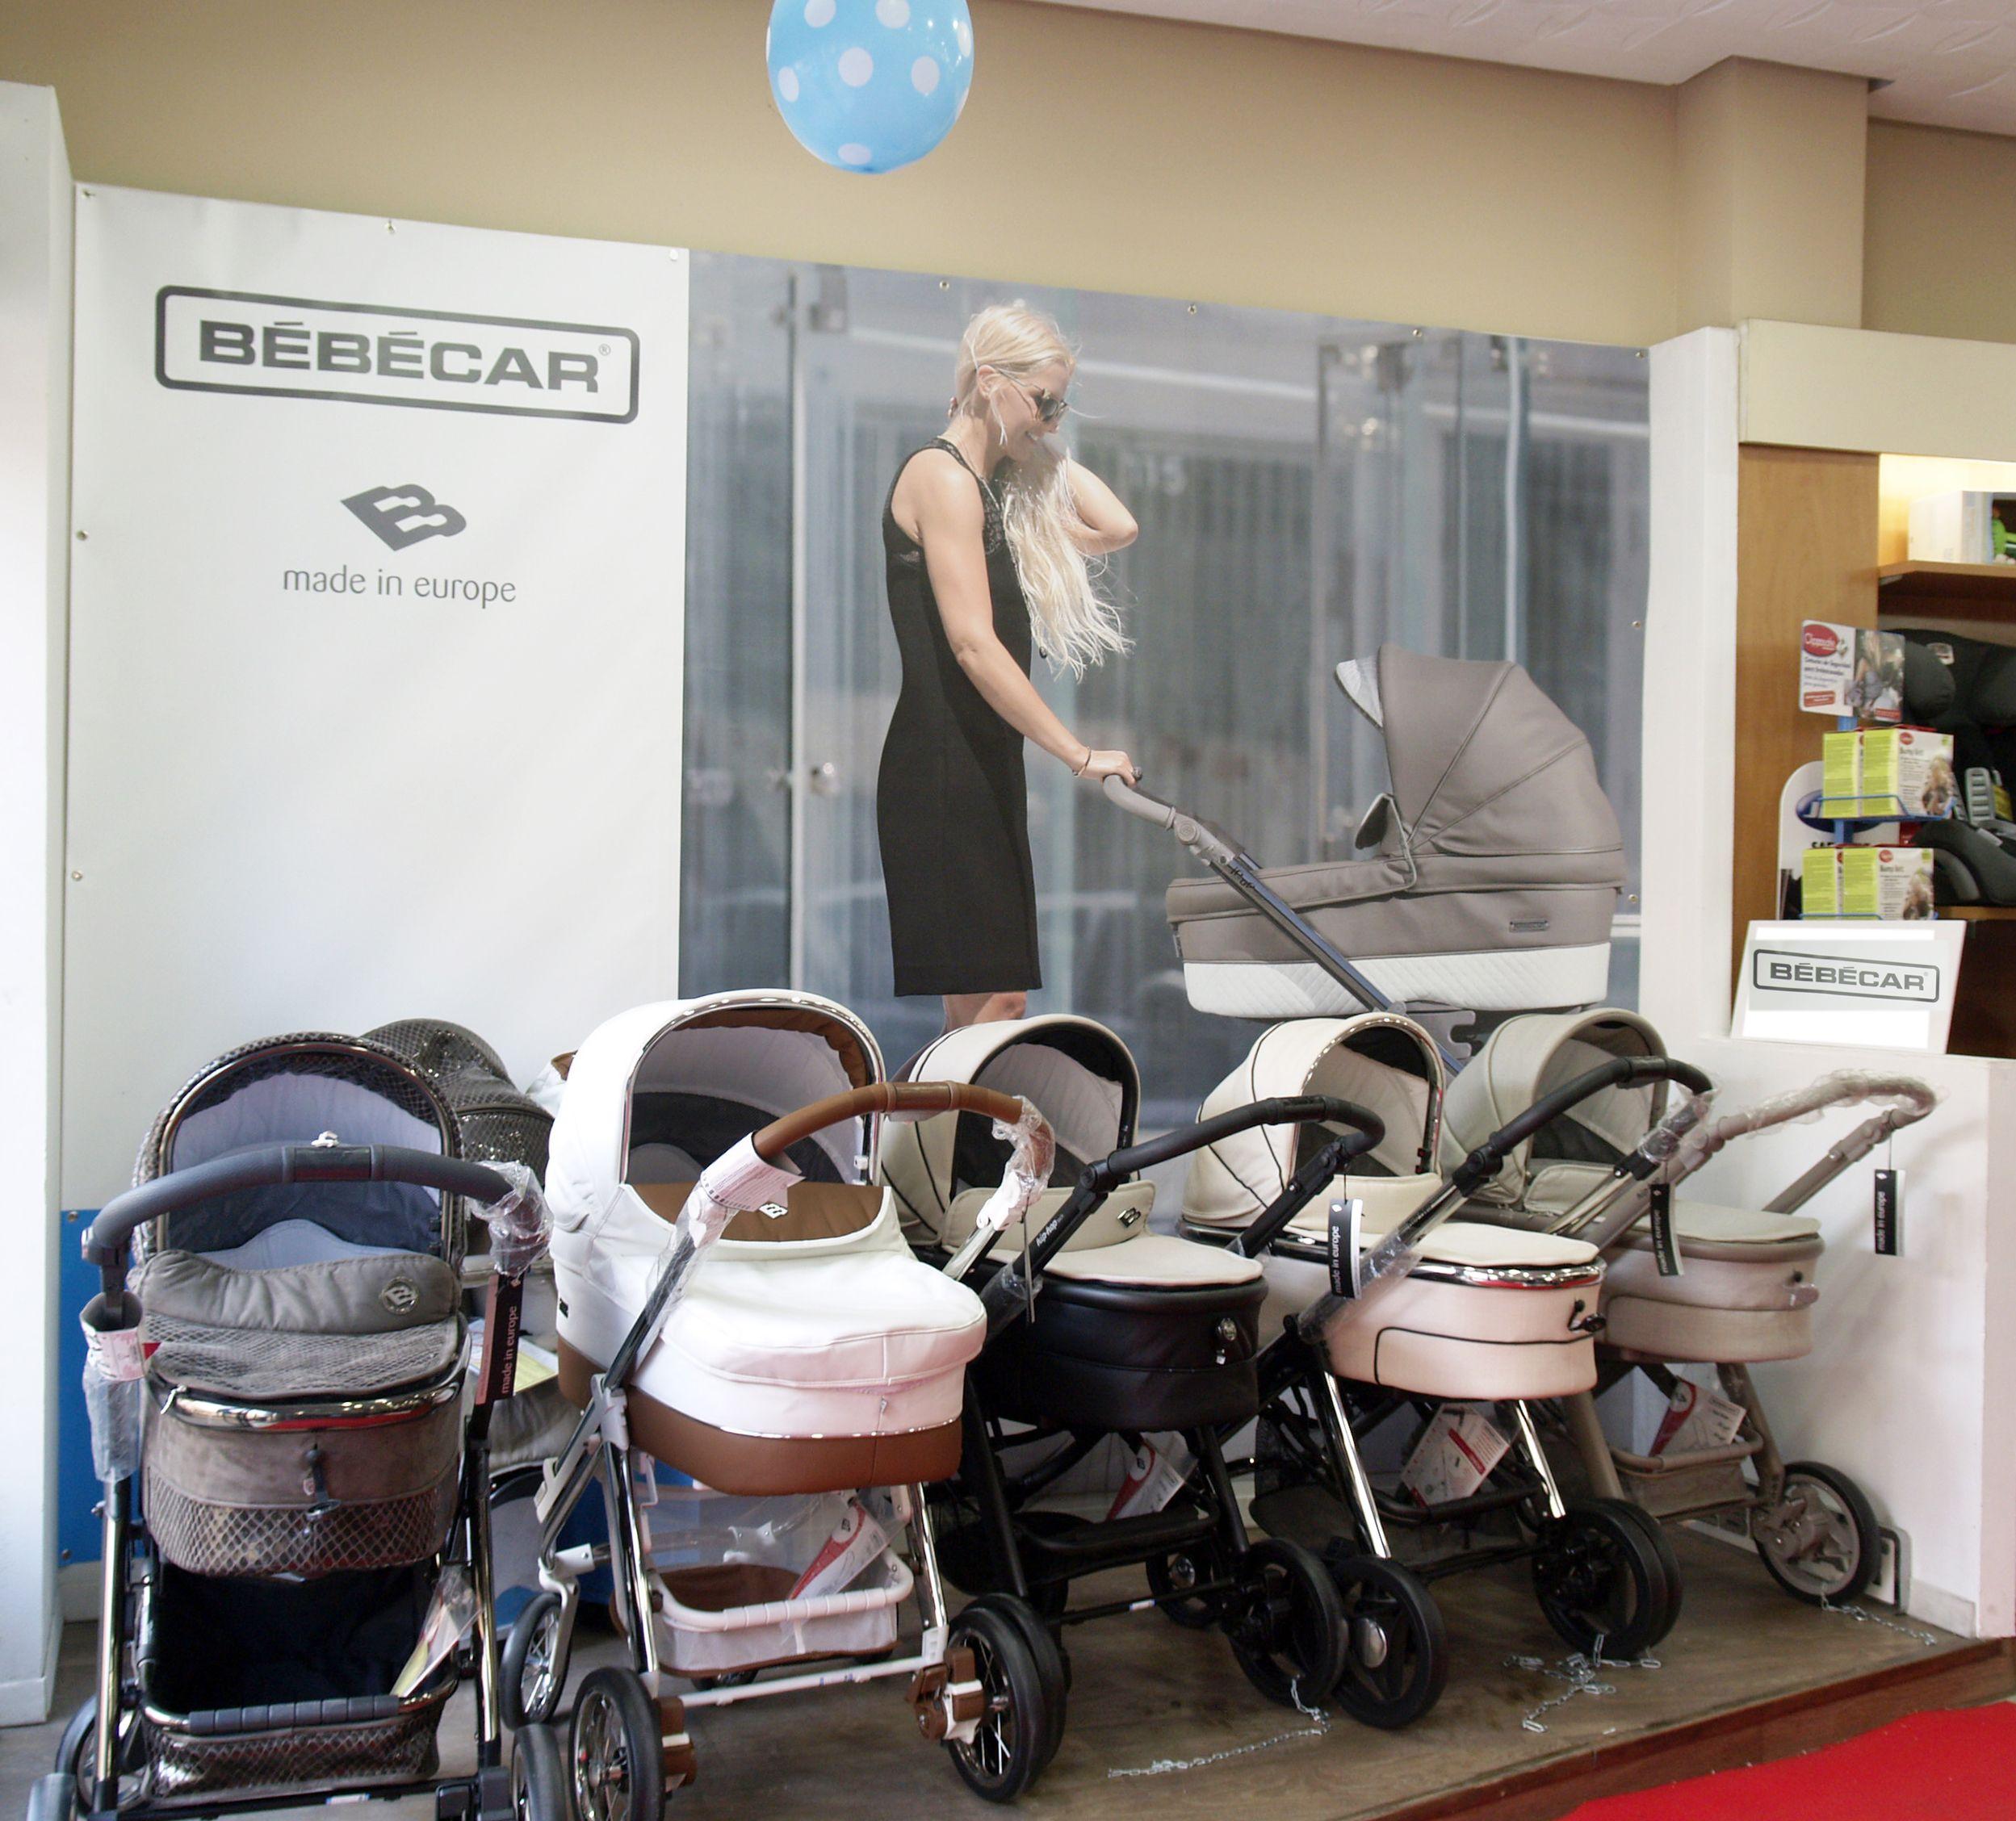 Venta de carritos de bebé en Sevilla